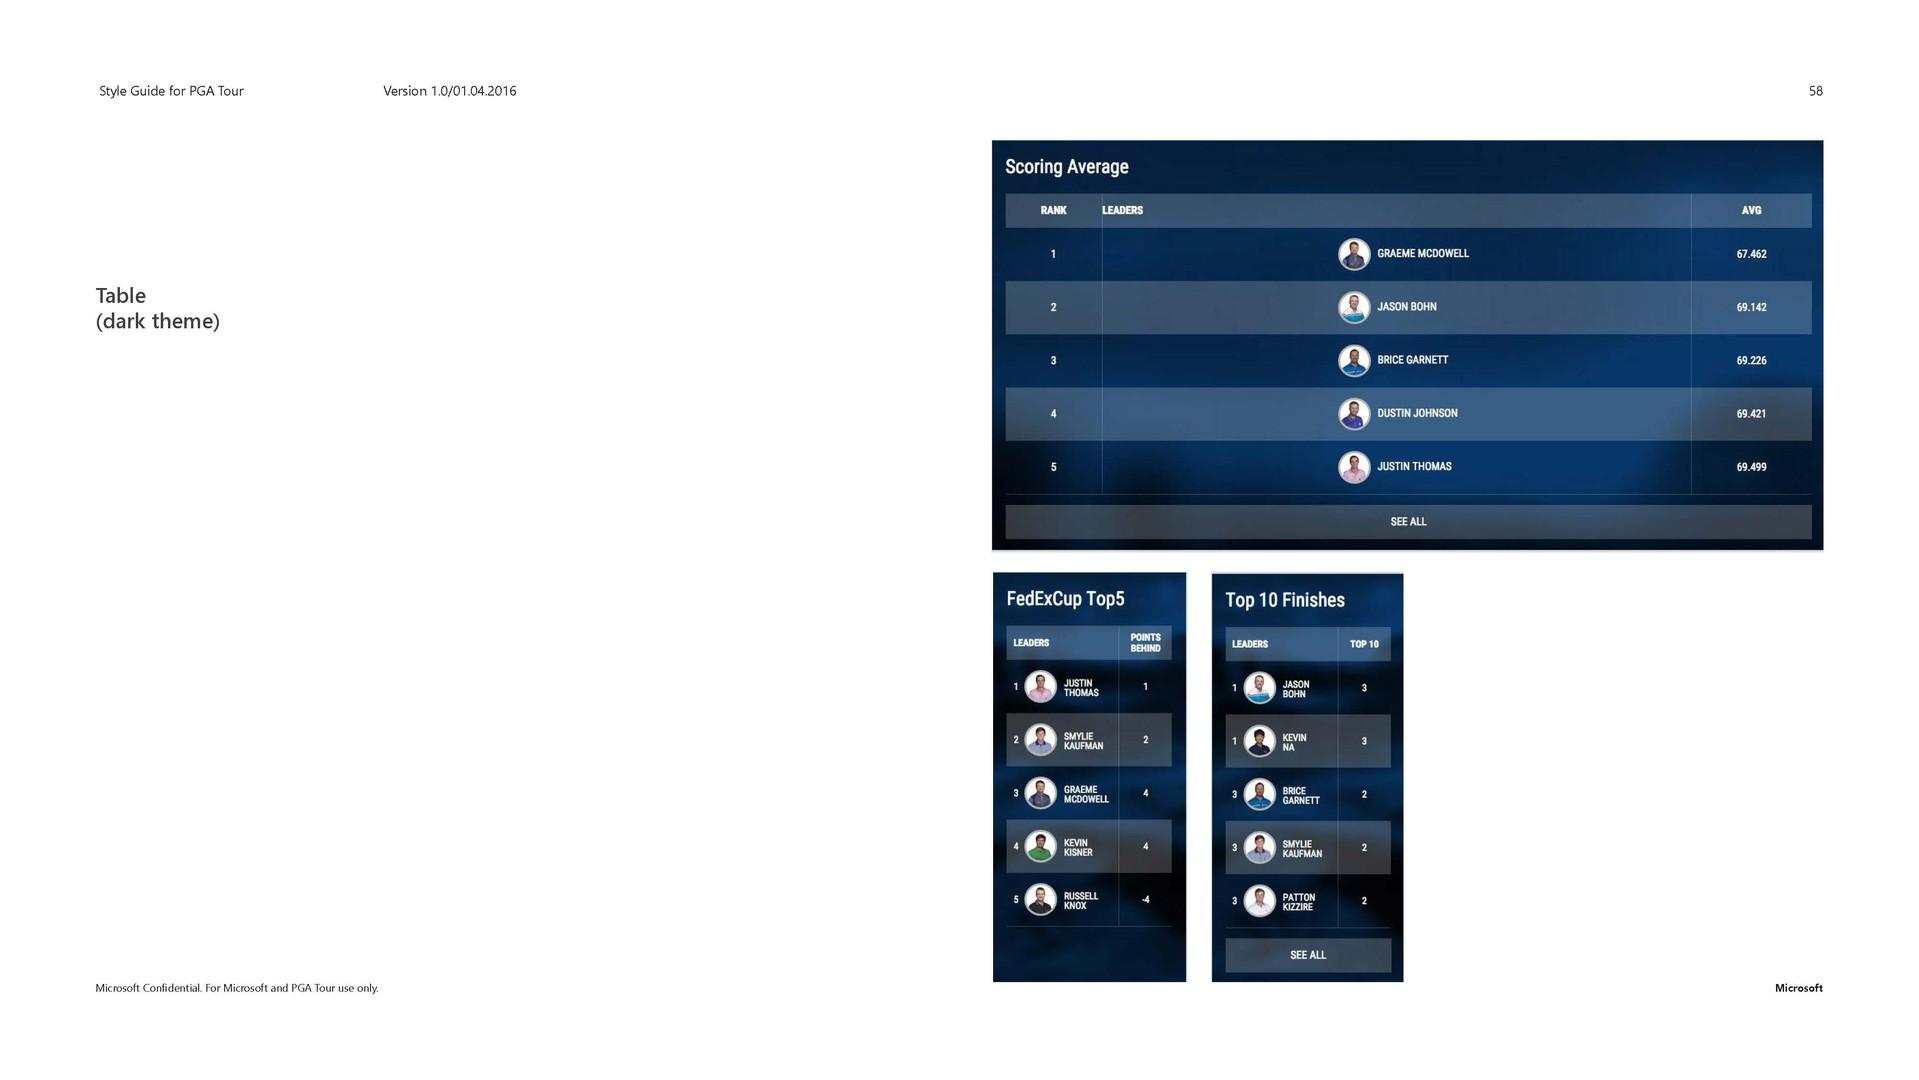 PGA-Tour_StyleGuide_v2.0_Page_58.jpg